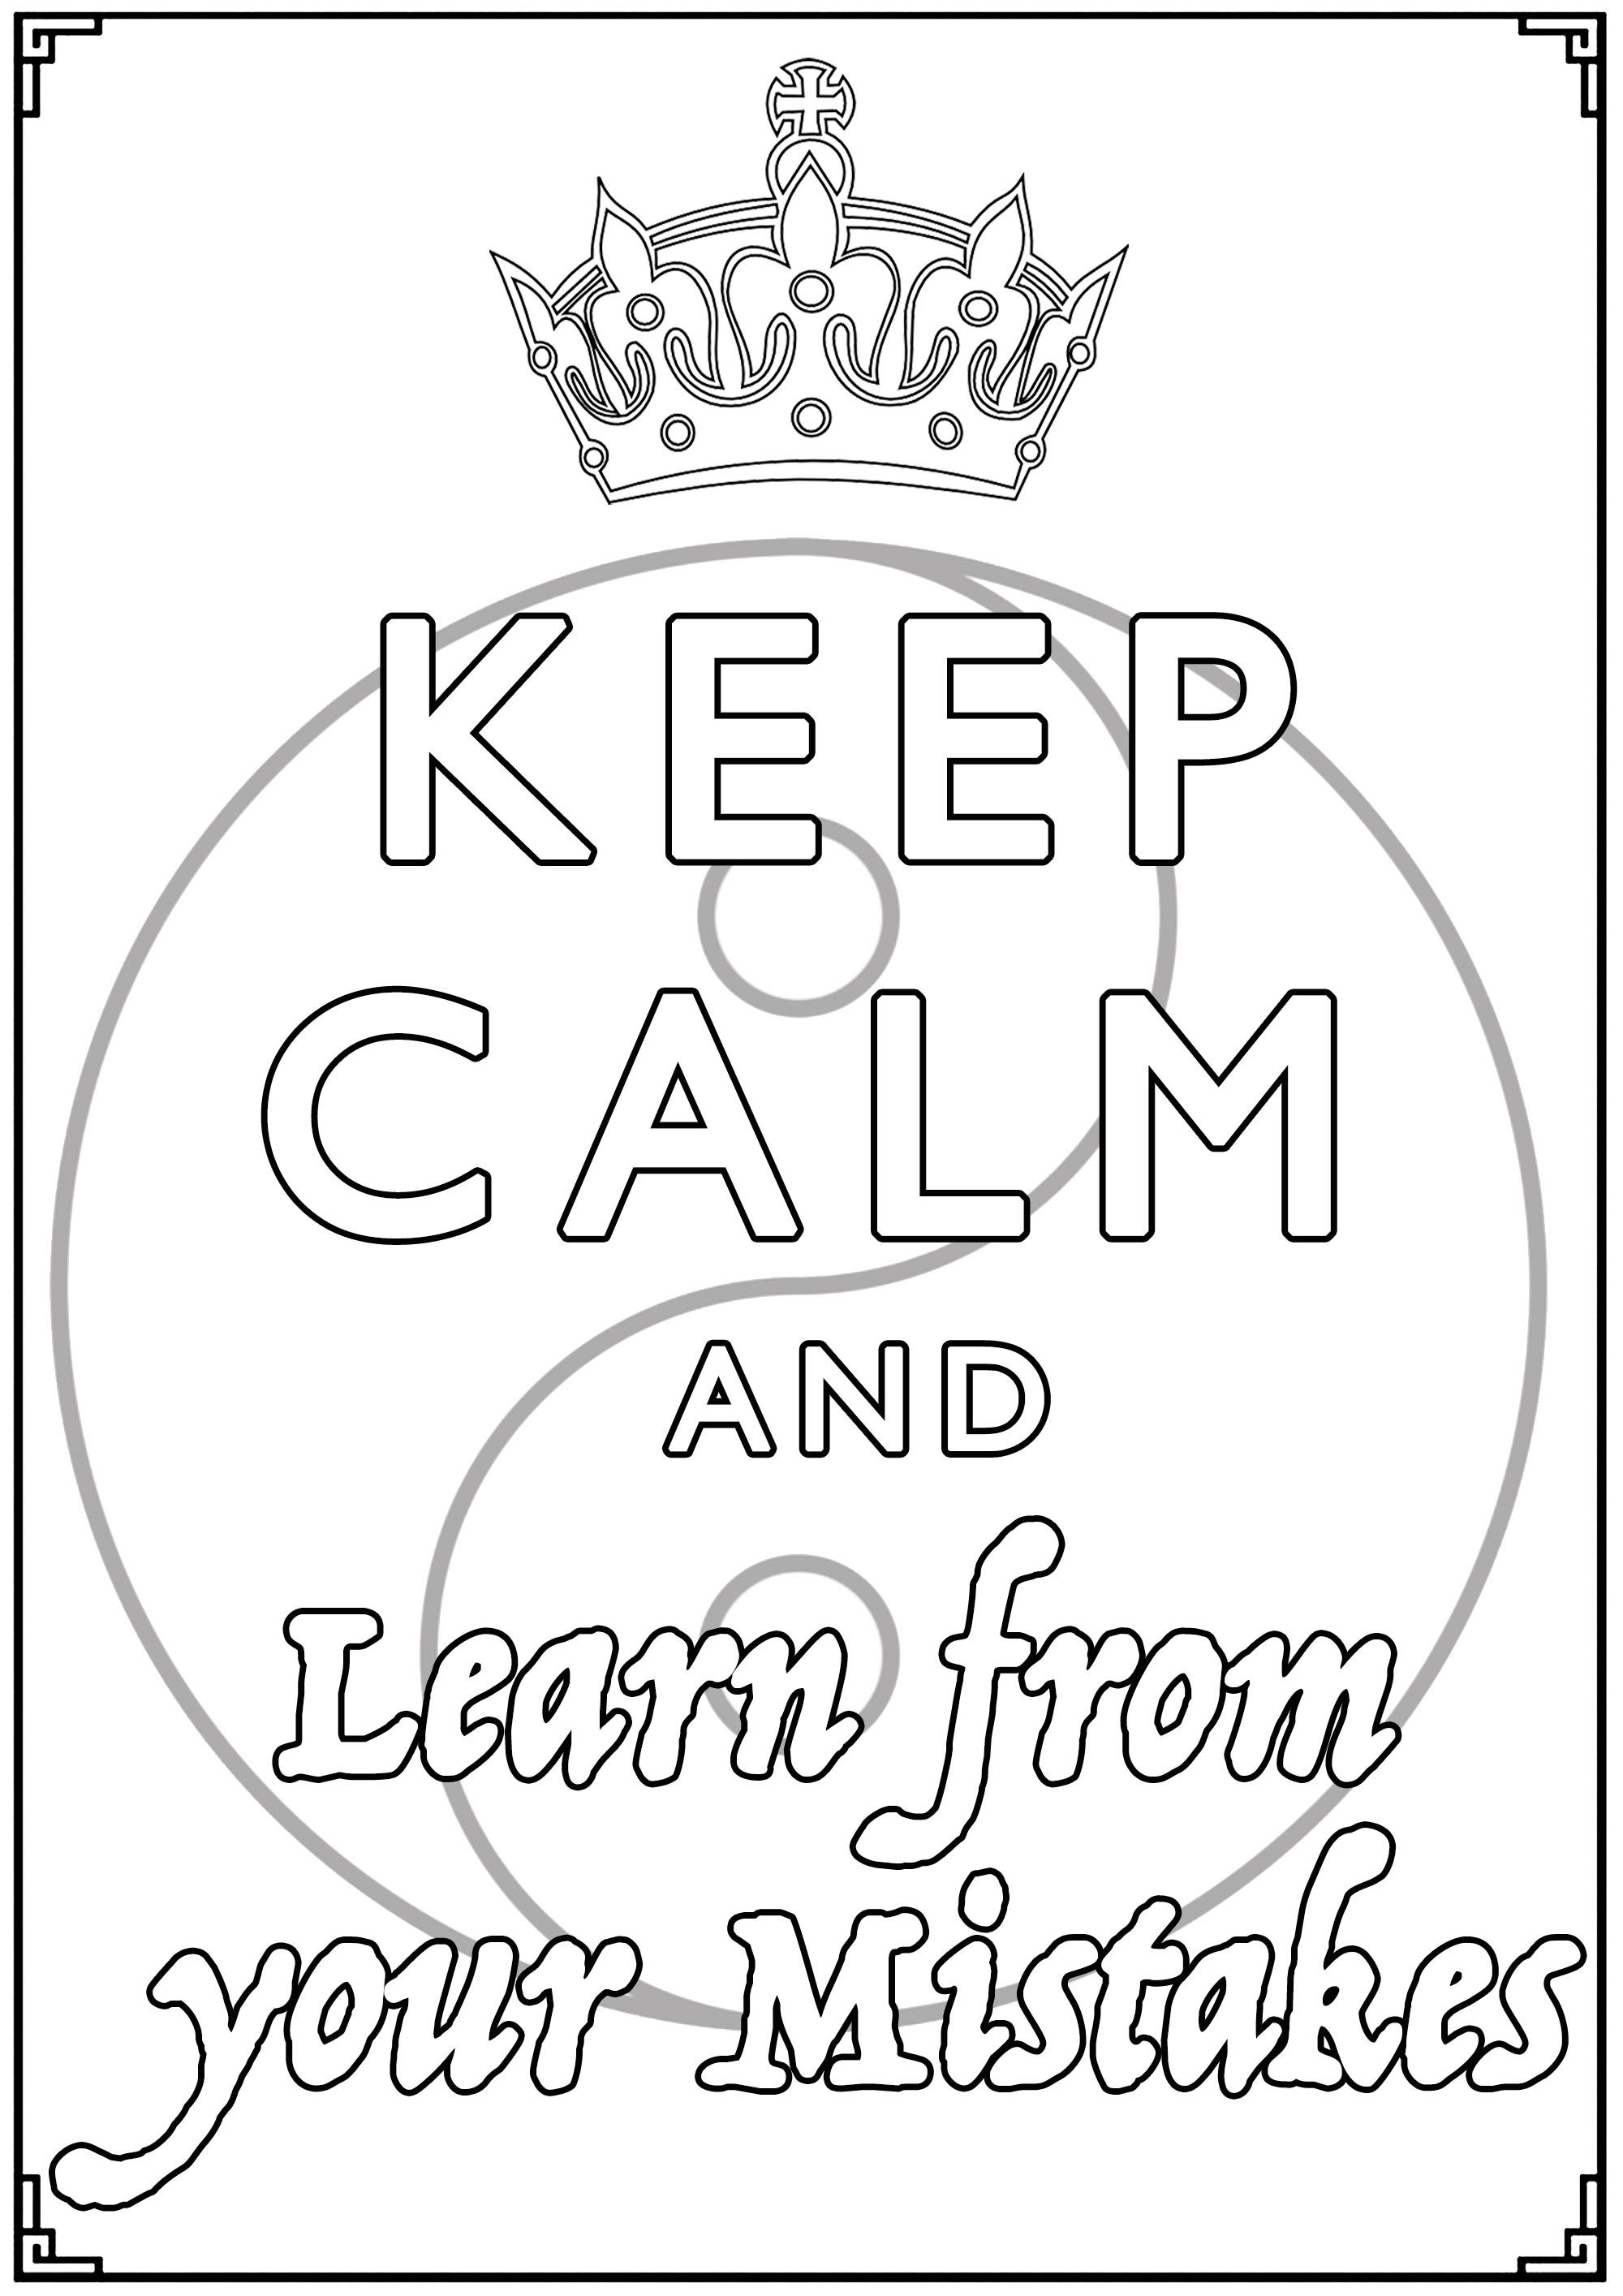 Disegni da Colorare per Adulti : Keep Calm - 14